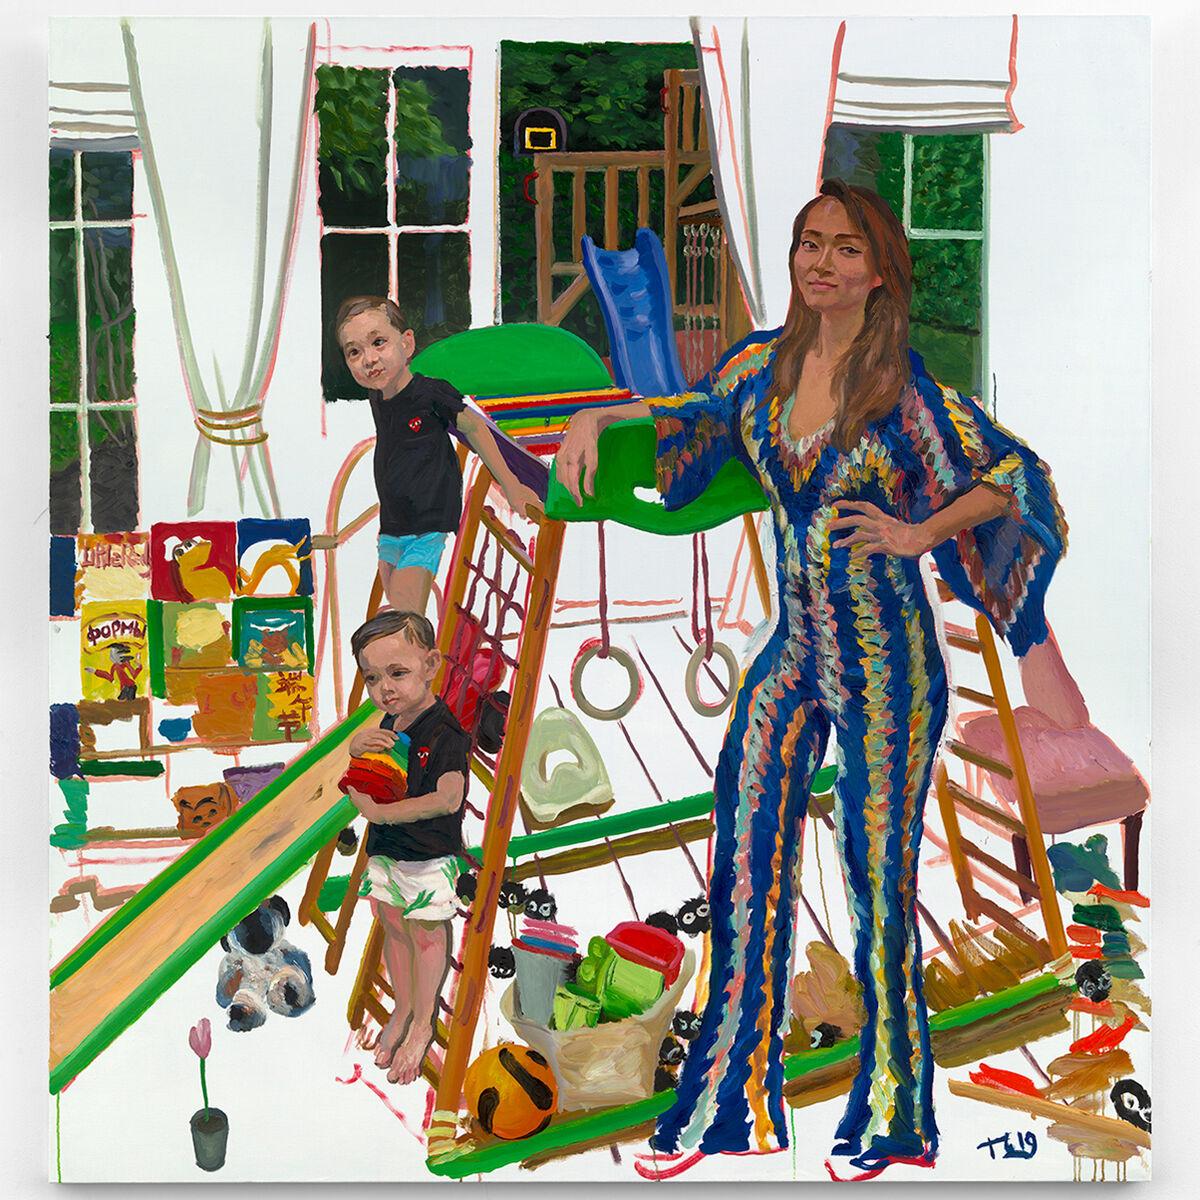 Liu Xiaodong, Veronica 和她的混⾎血双棒 (Veronica and her Twins), 2019. Courtesy of the artist and Massimo De Carlo, Milan/London/Hong Kong.